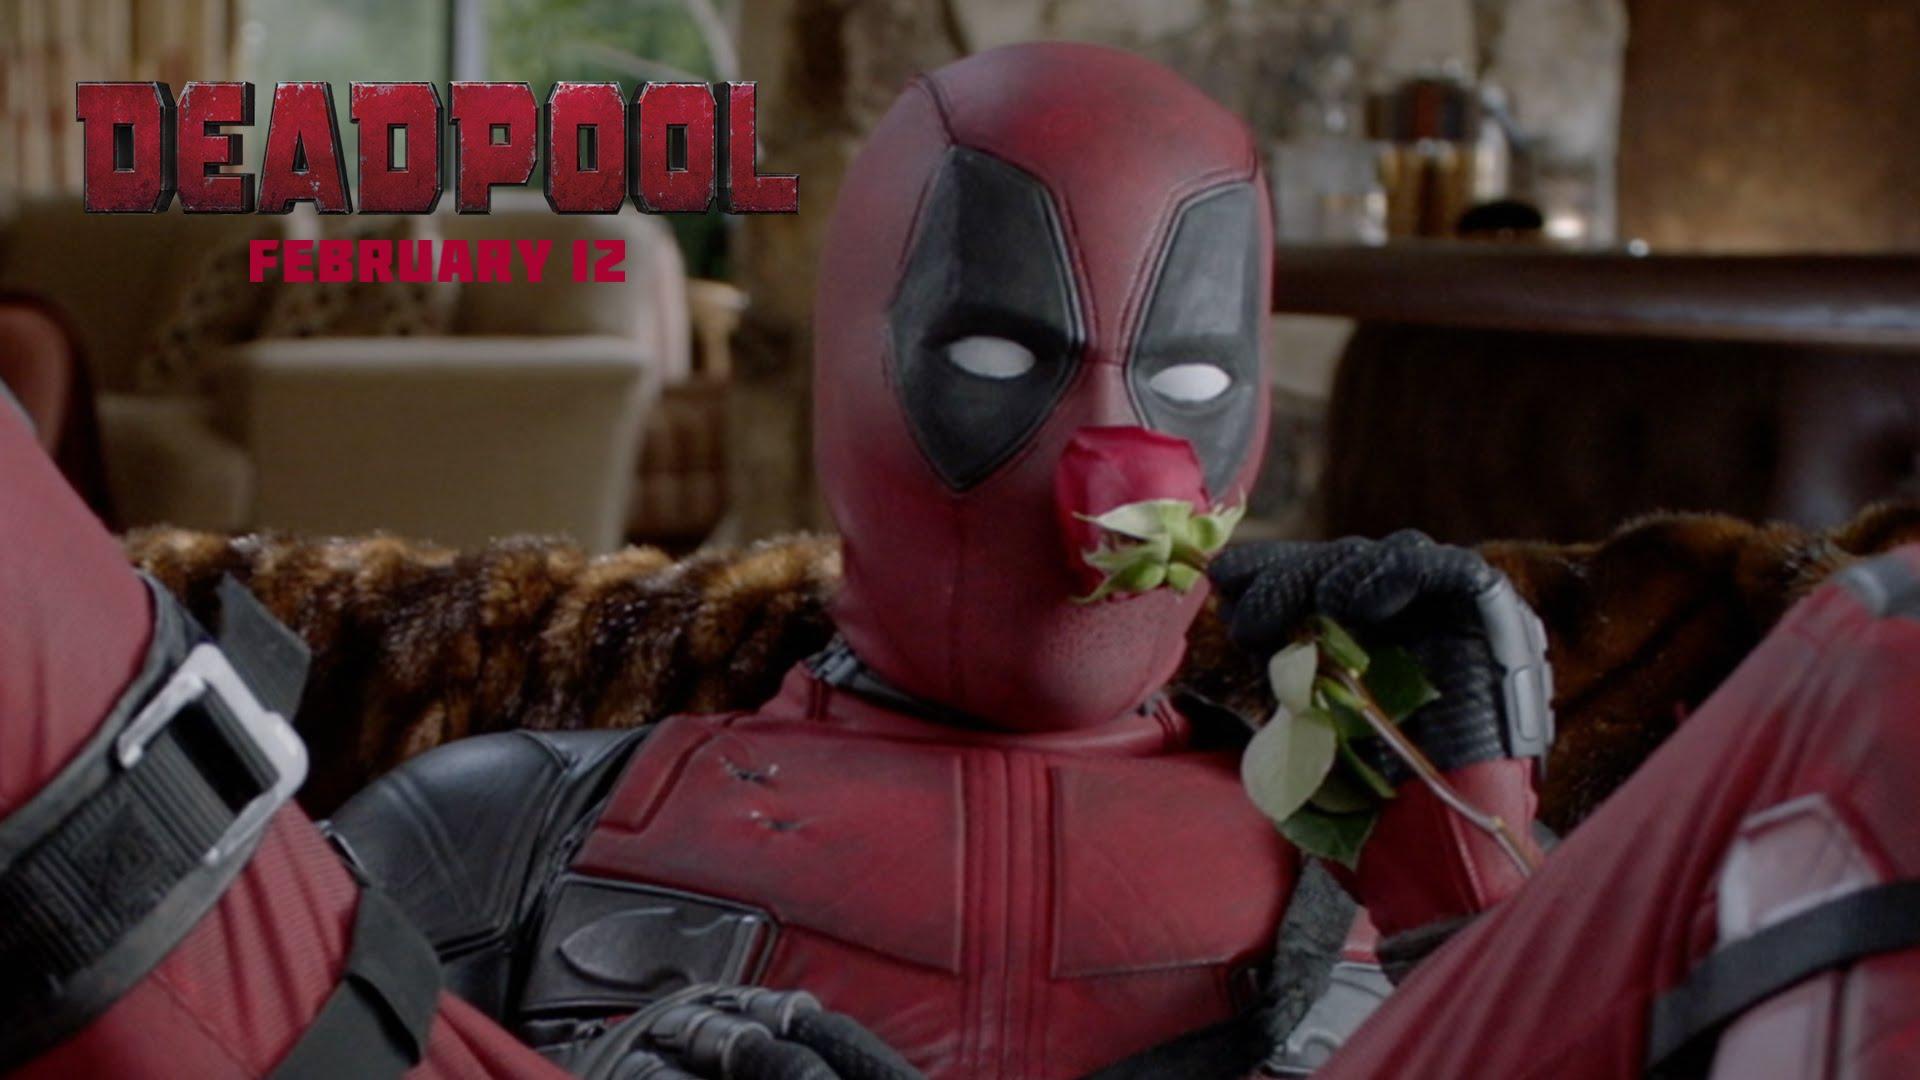 Deadpool | Blatant Bachelor Baiting TV Spot (w/ 2% real roses) | 20th Century FOX